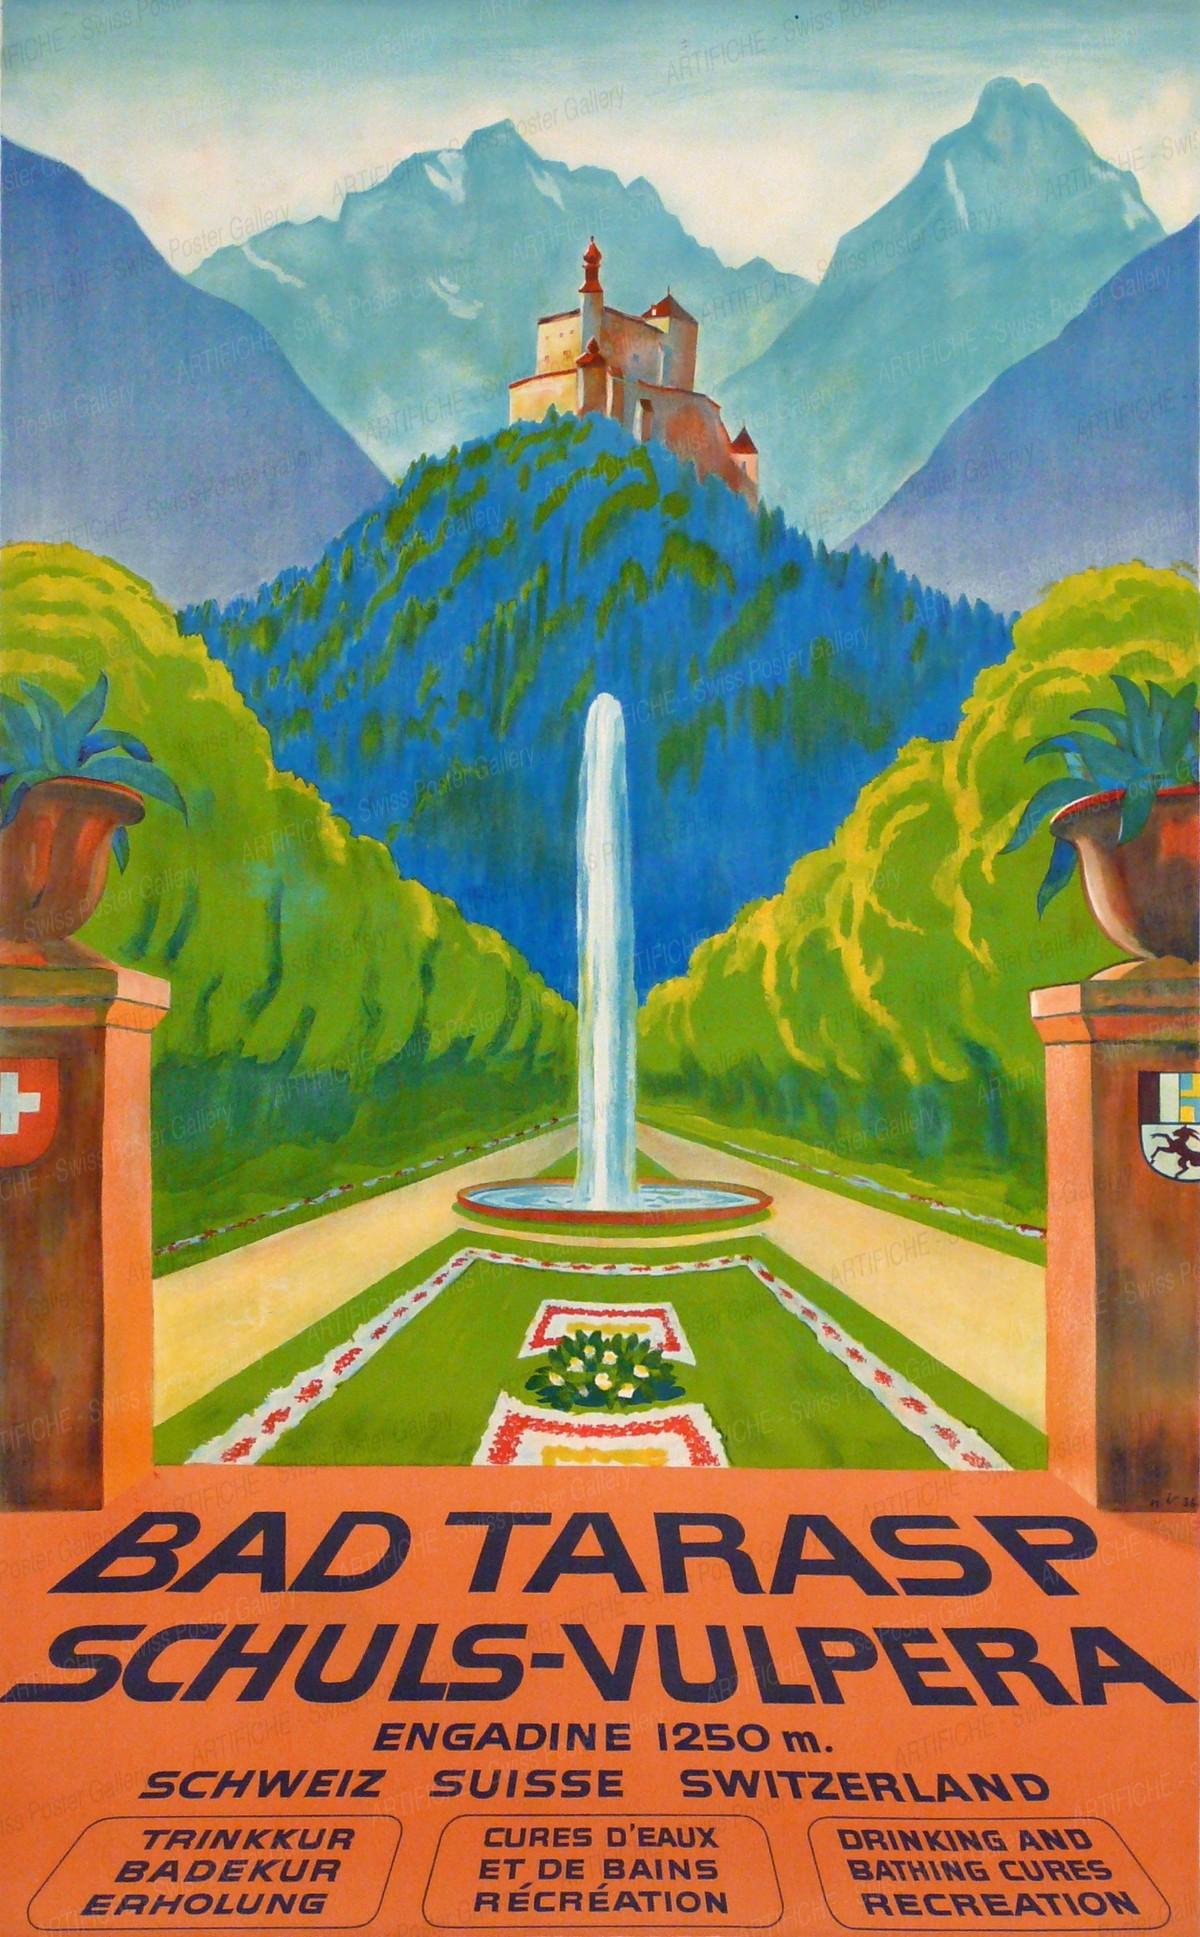 BAD TARASP-SCHULS-VULPERA, Hugo Laubi